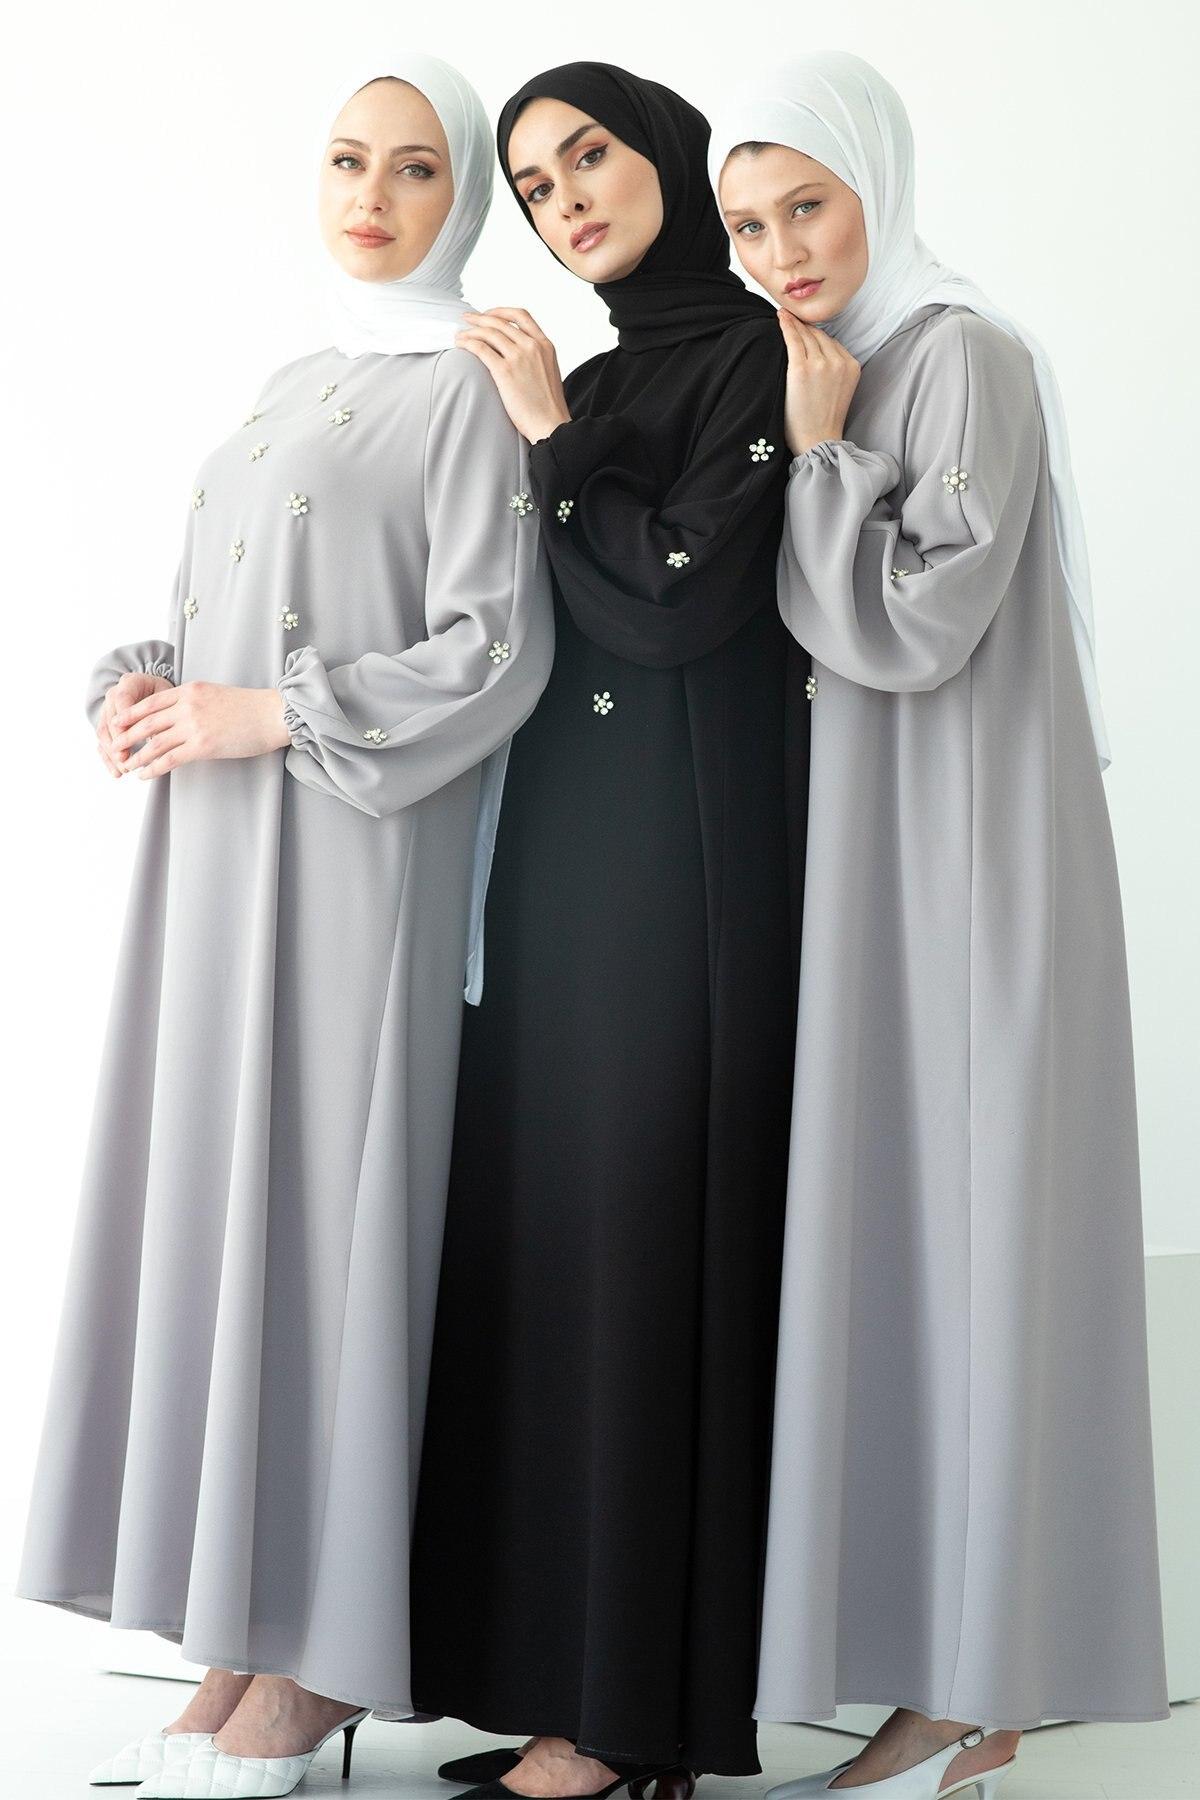 Muslim Dress Women Hand Sewn Drill Raglan Sleeve long Dress Middle East Ramadan Dress Arab Women Dress Abaya Dubai Abaya Turkey gauzy raglan sleeve crane pattern tied dress